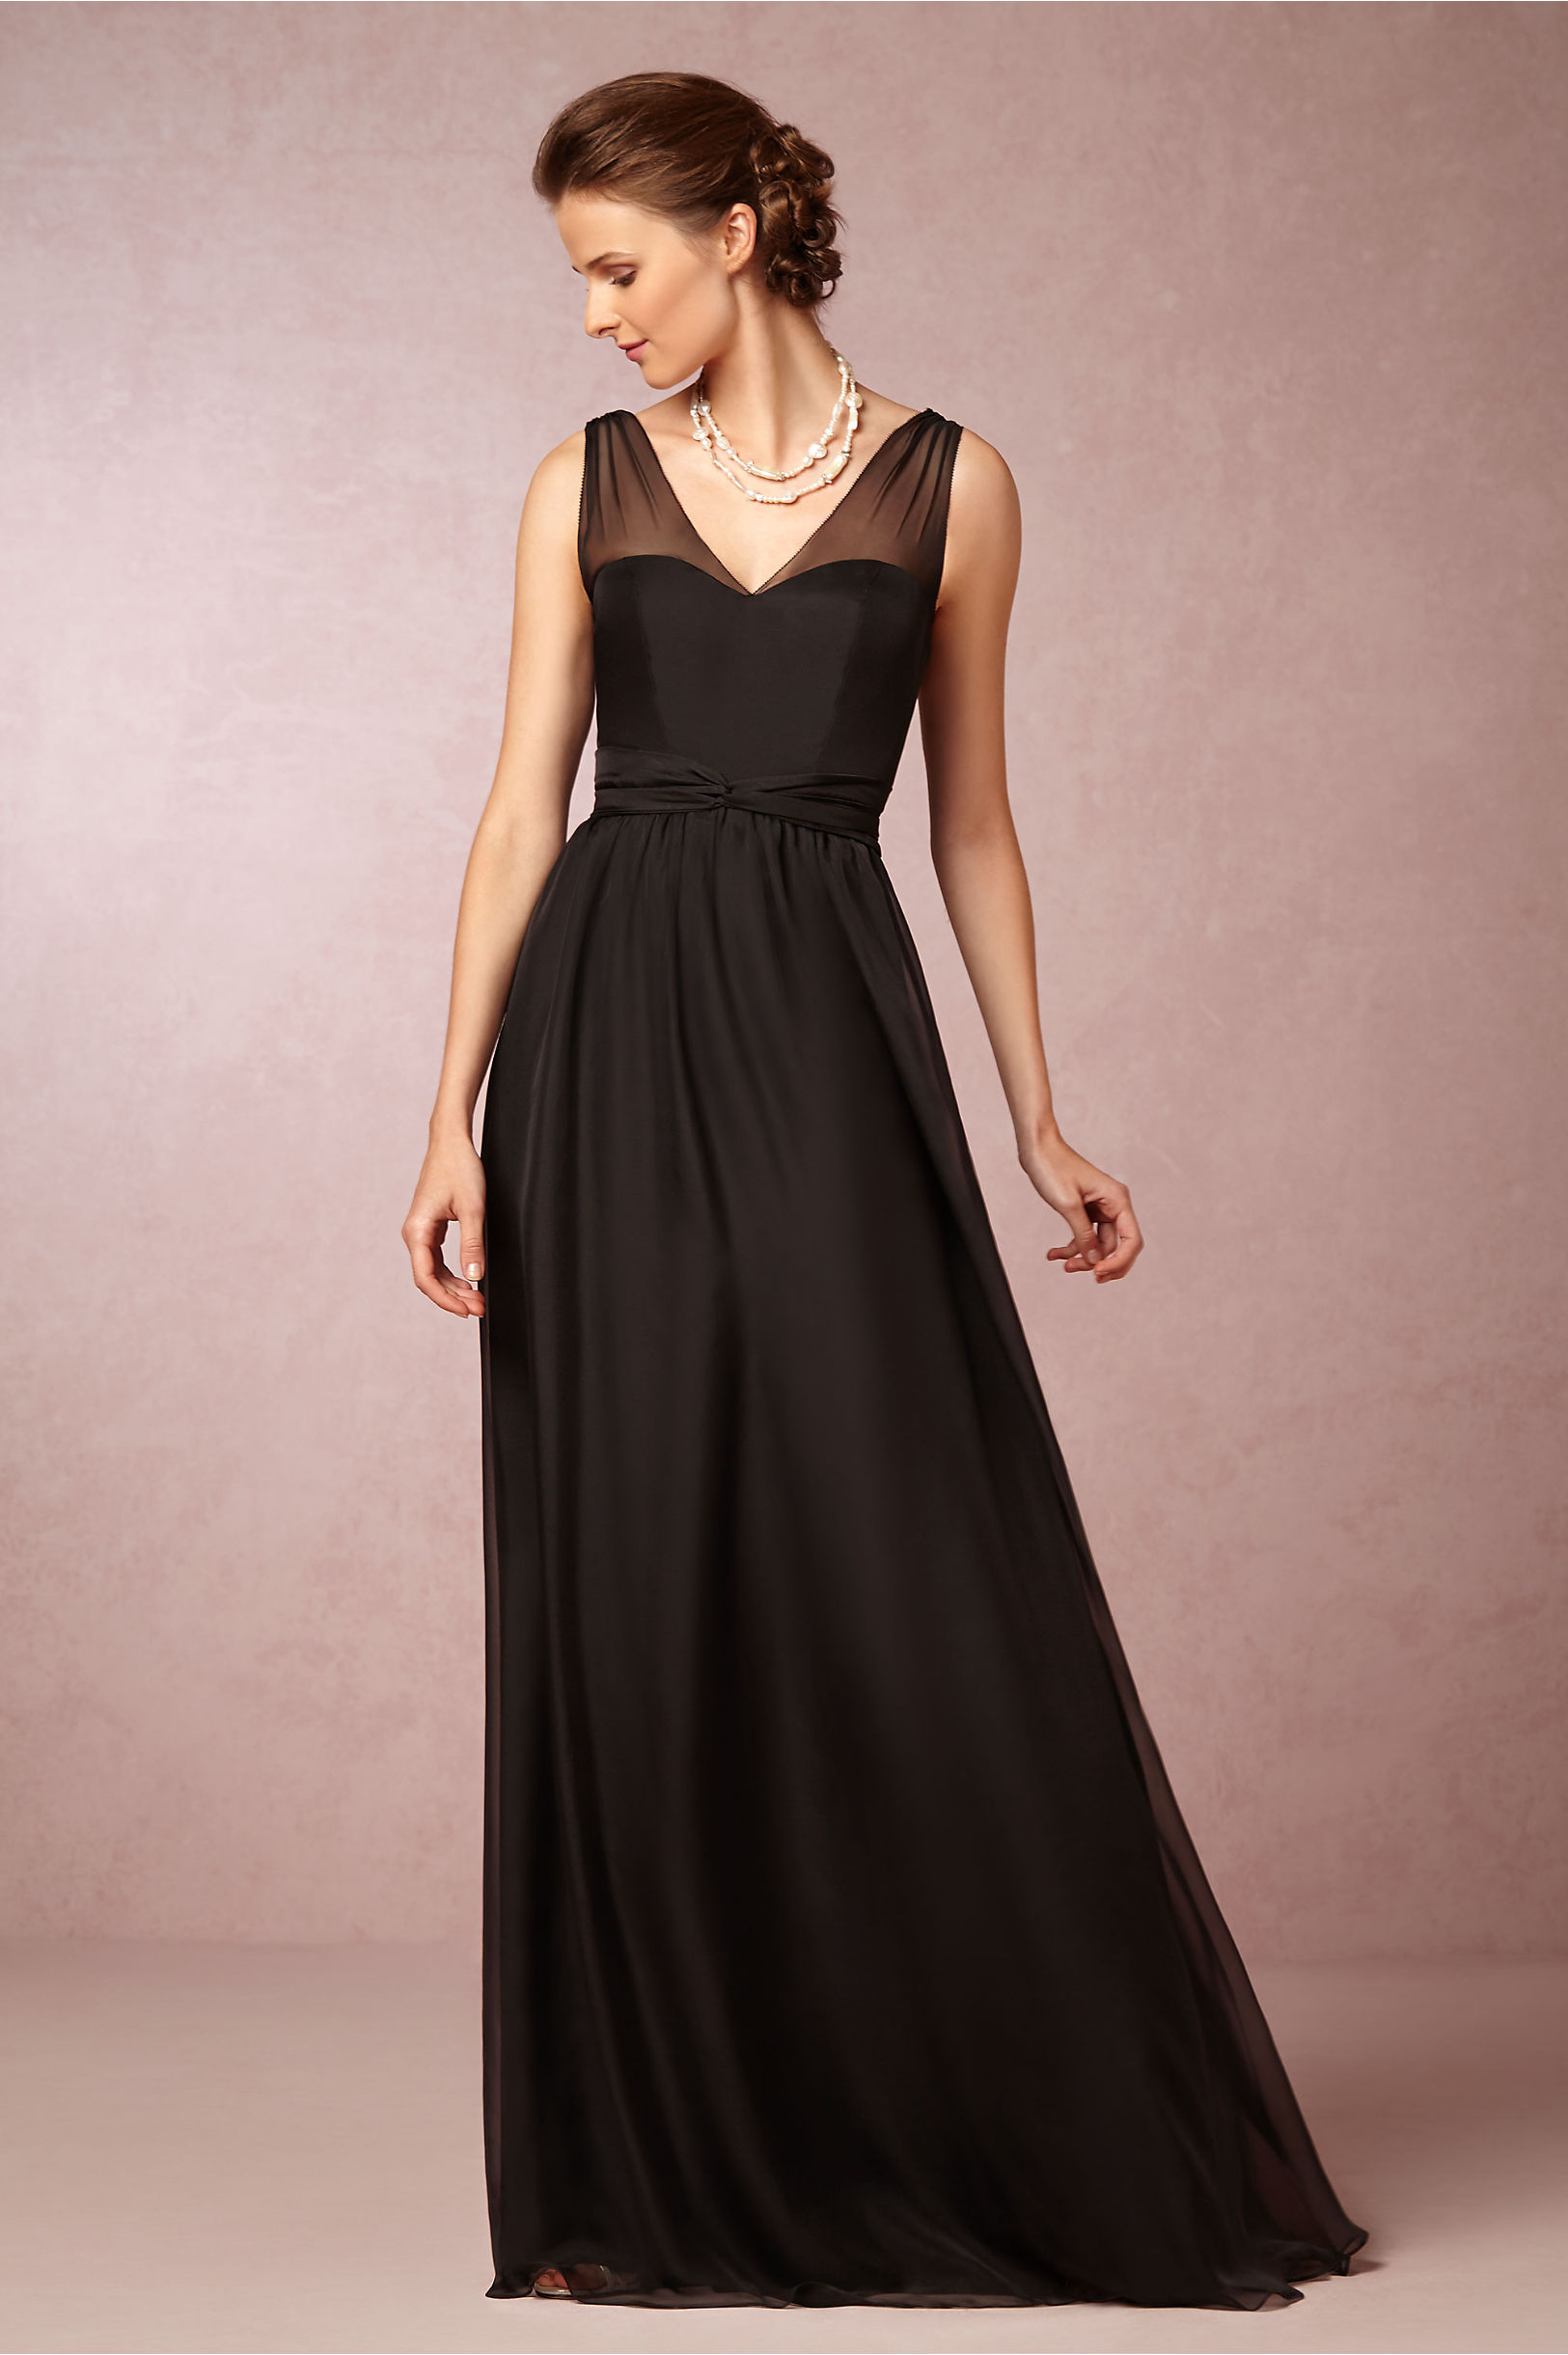 Black dress bridesmaid - Black Josephine Dress Bhldn